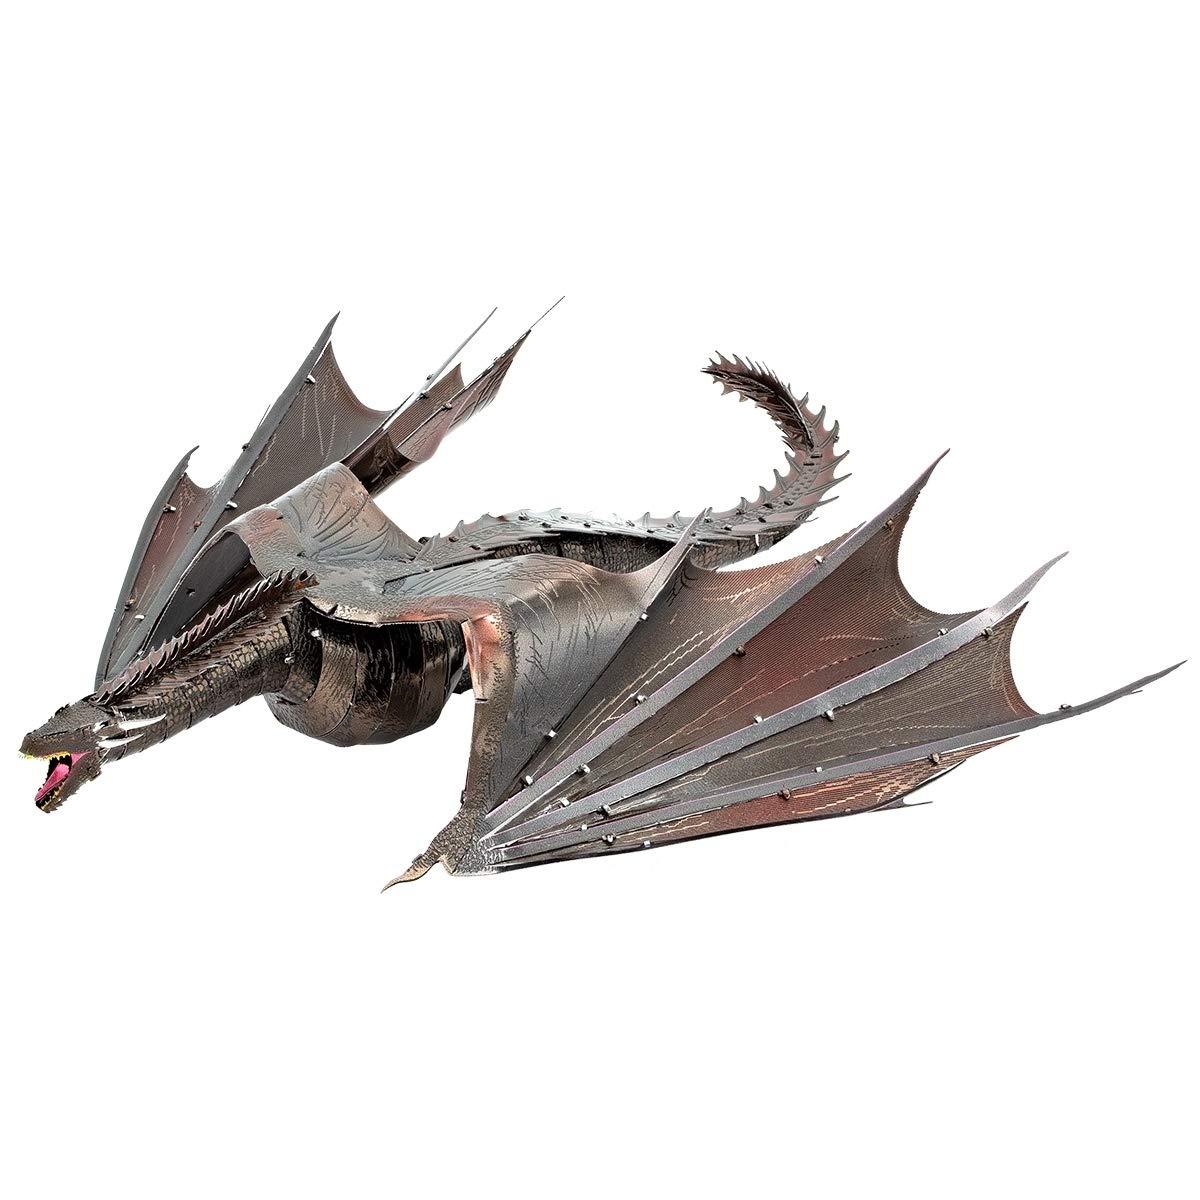 Fascinations Metal Earth ICONX Game of Thrones Drogon 3D Metal Model Kit